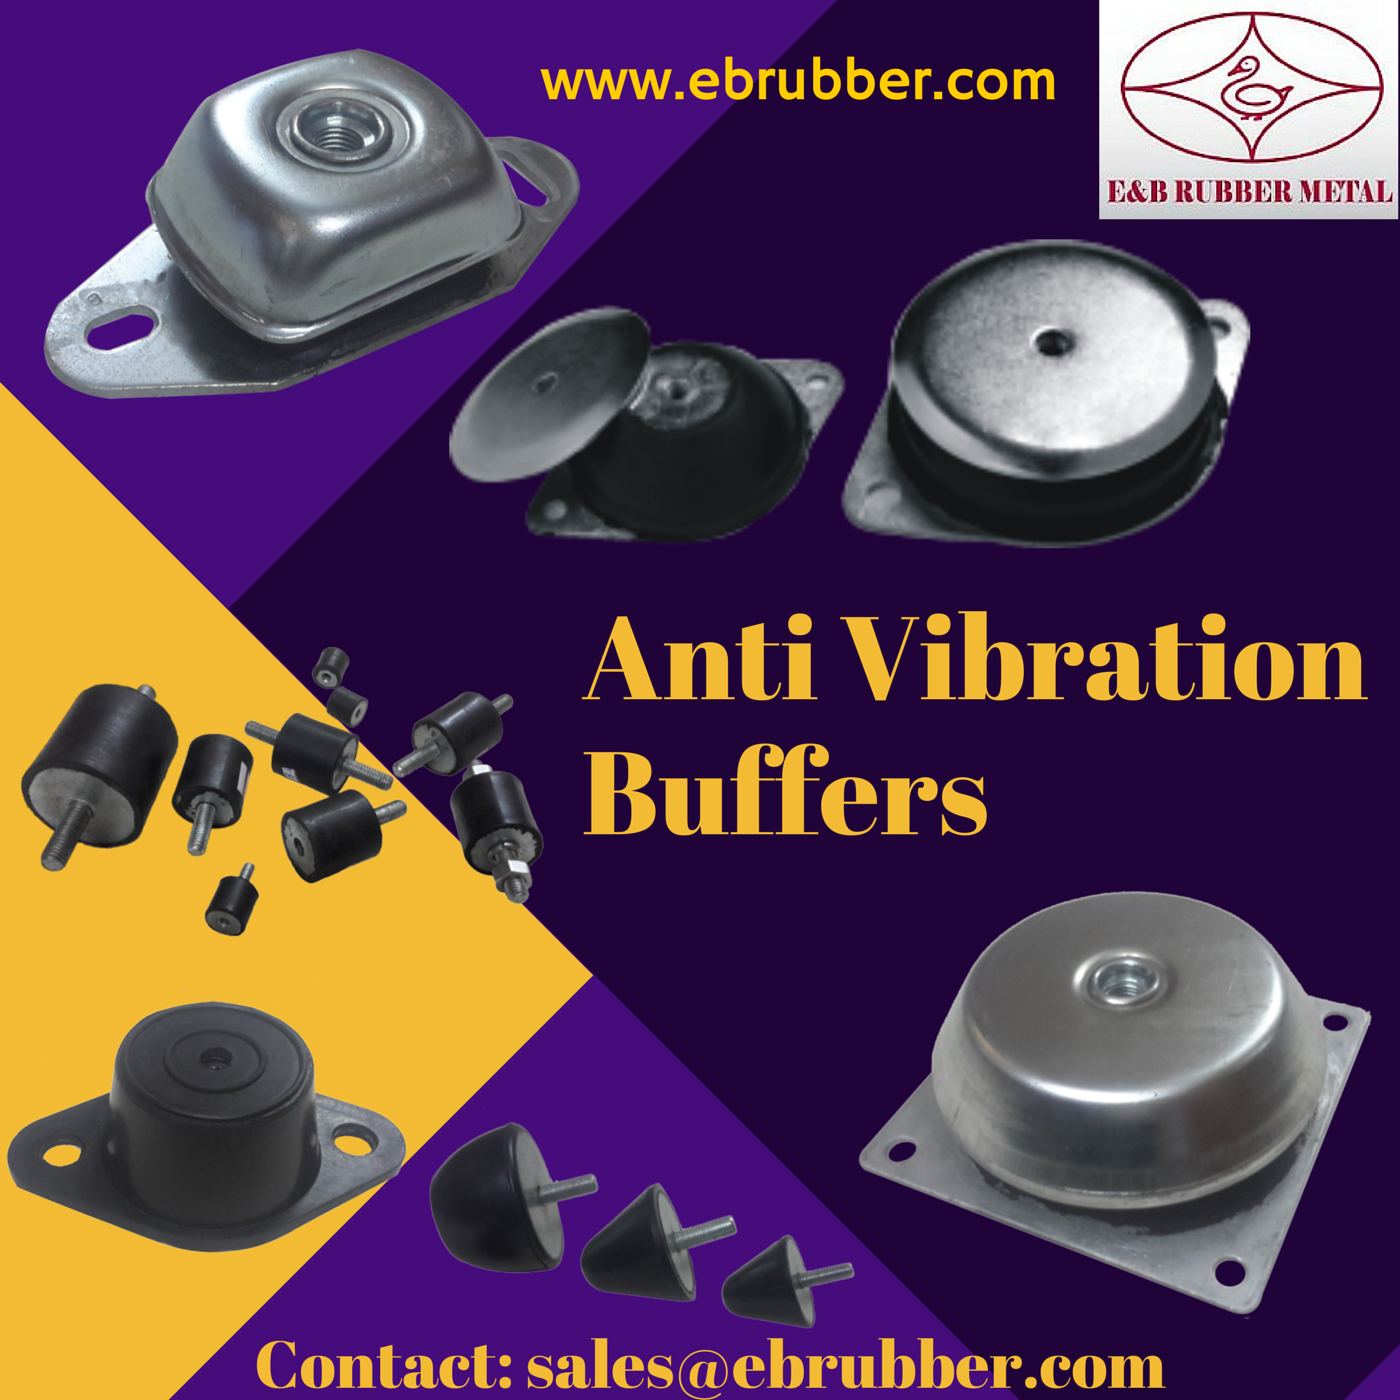 Dynemech Systems Vibration Control Anti Vibration